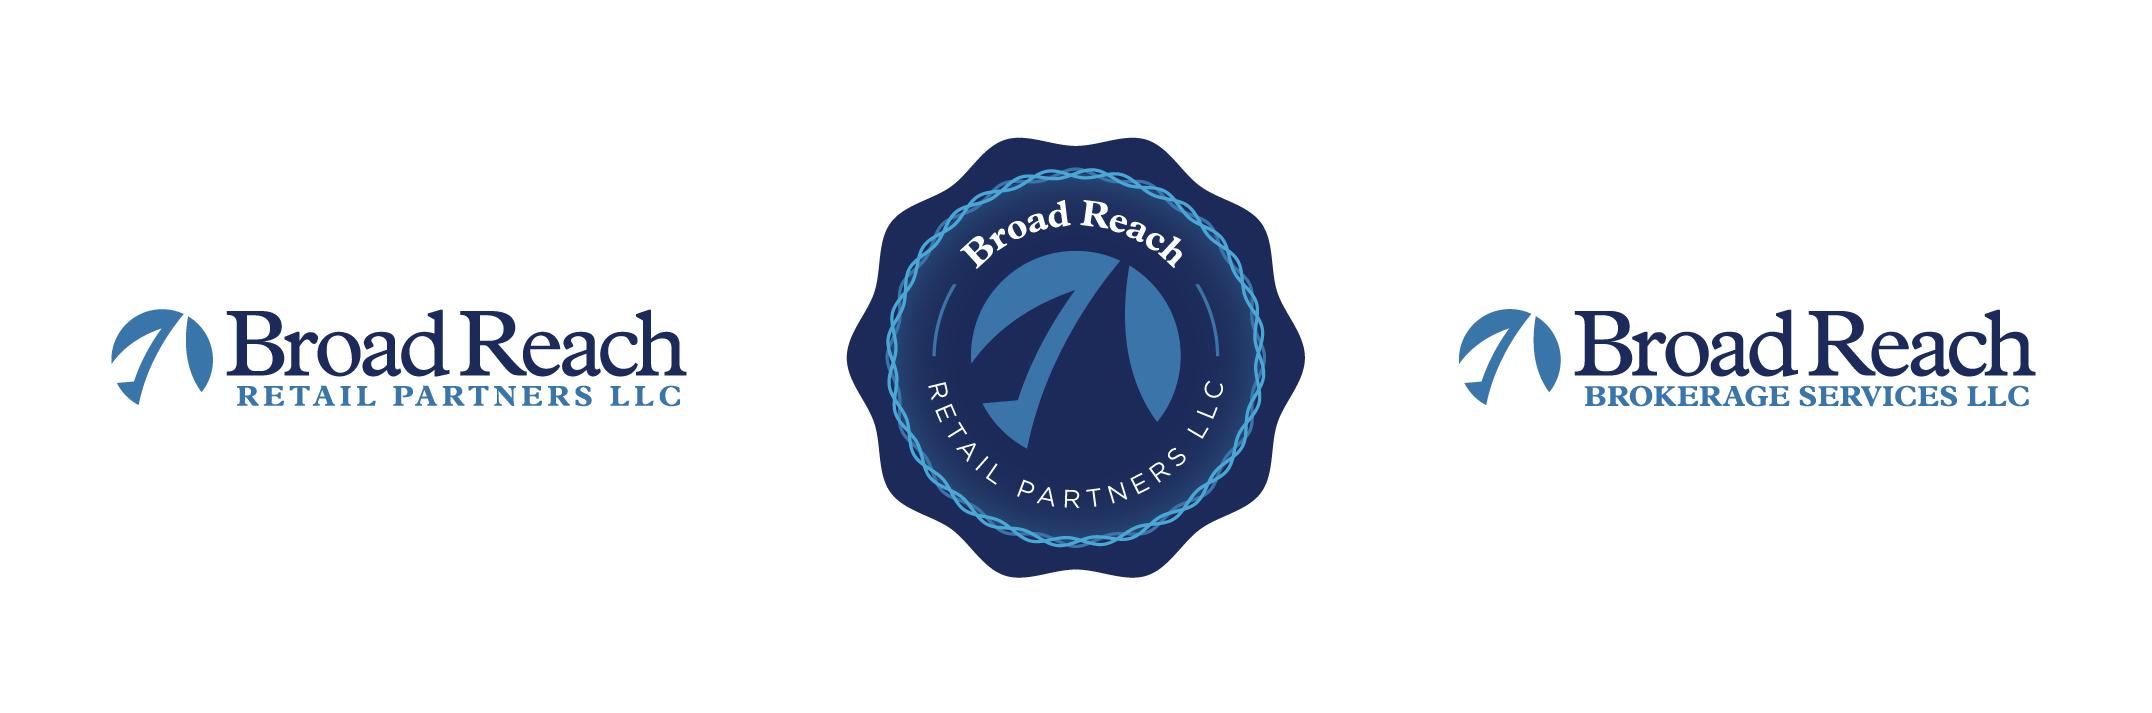 BroadReach_Case-study-graphics_5-b.jpg